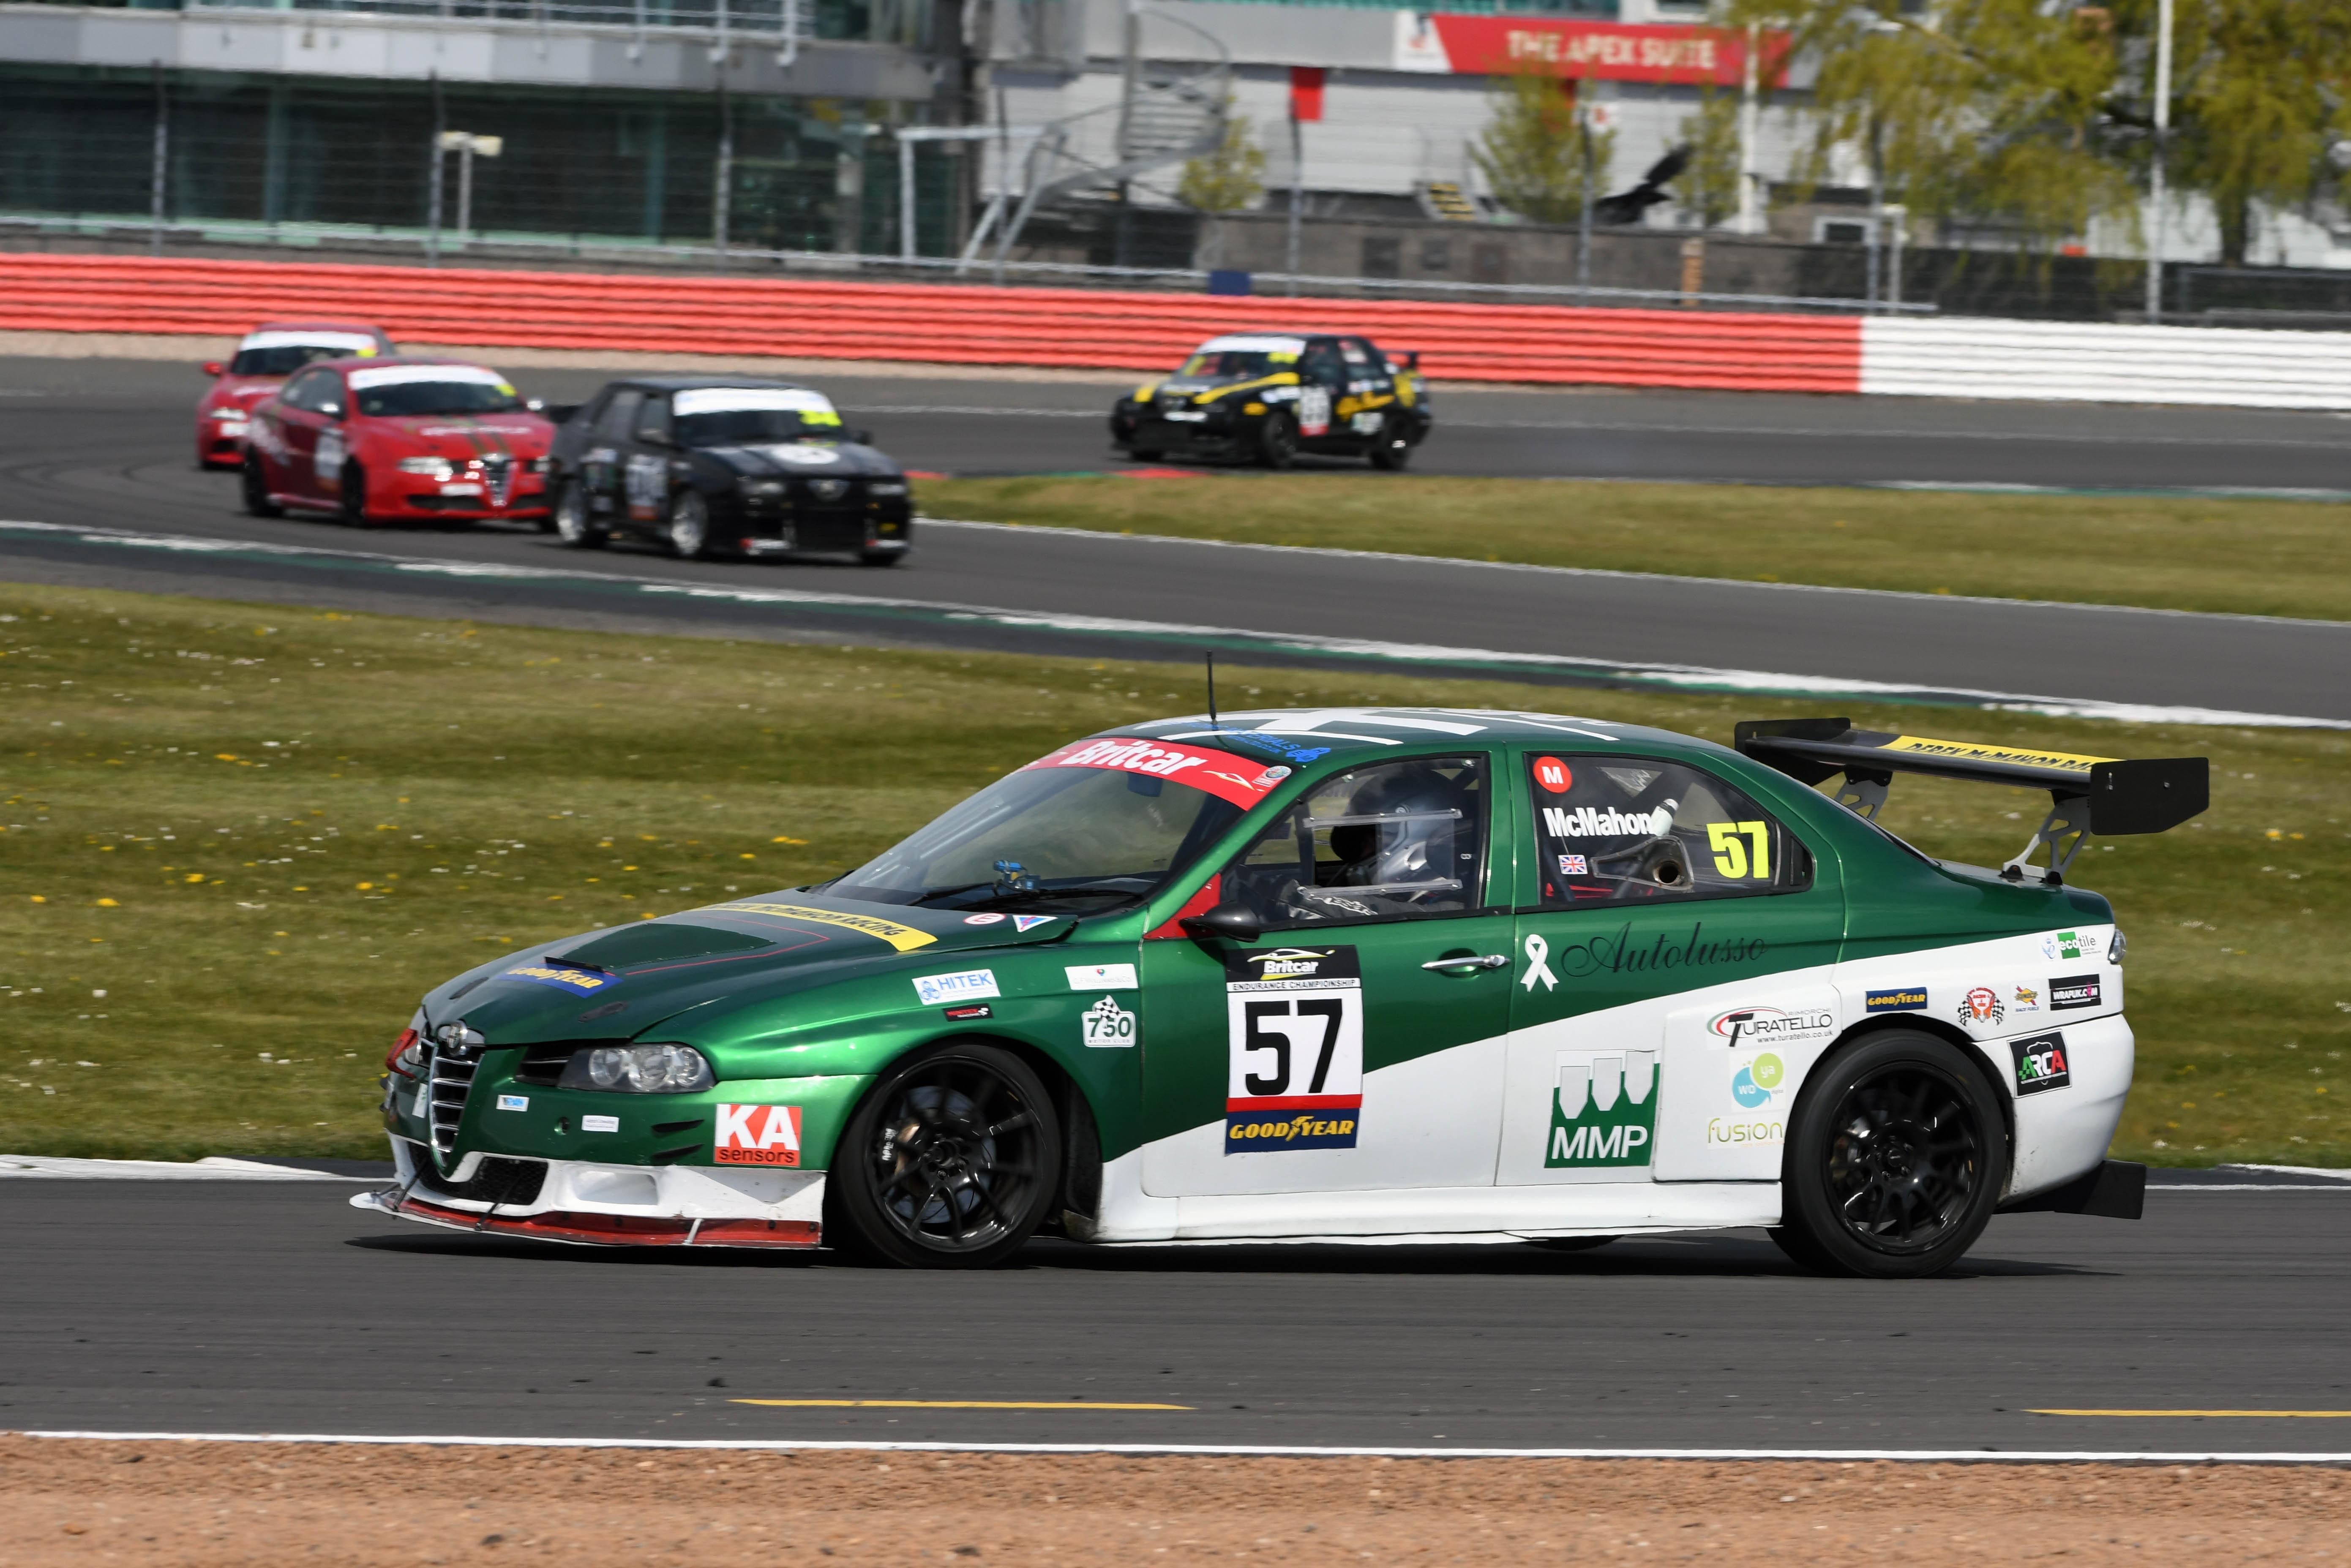 Barry McMahon (Alfa Romeo 156), Alfa Romeo Championship, Silverstone